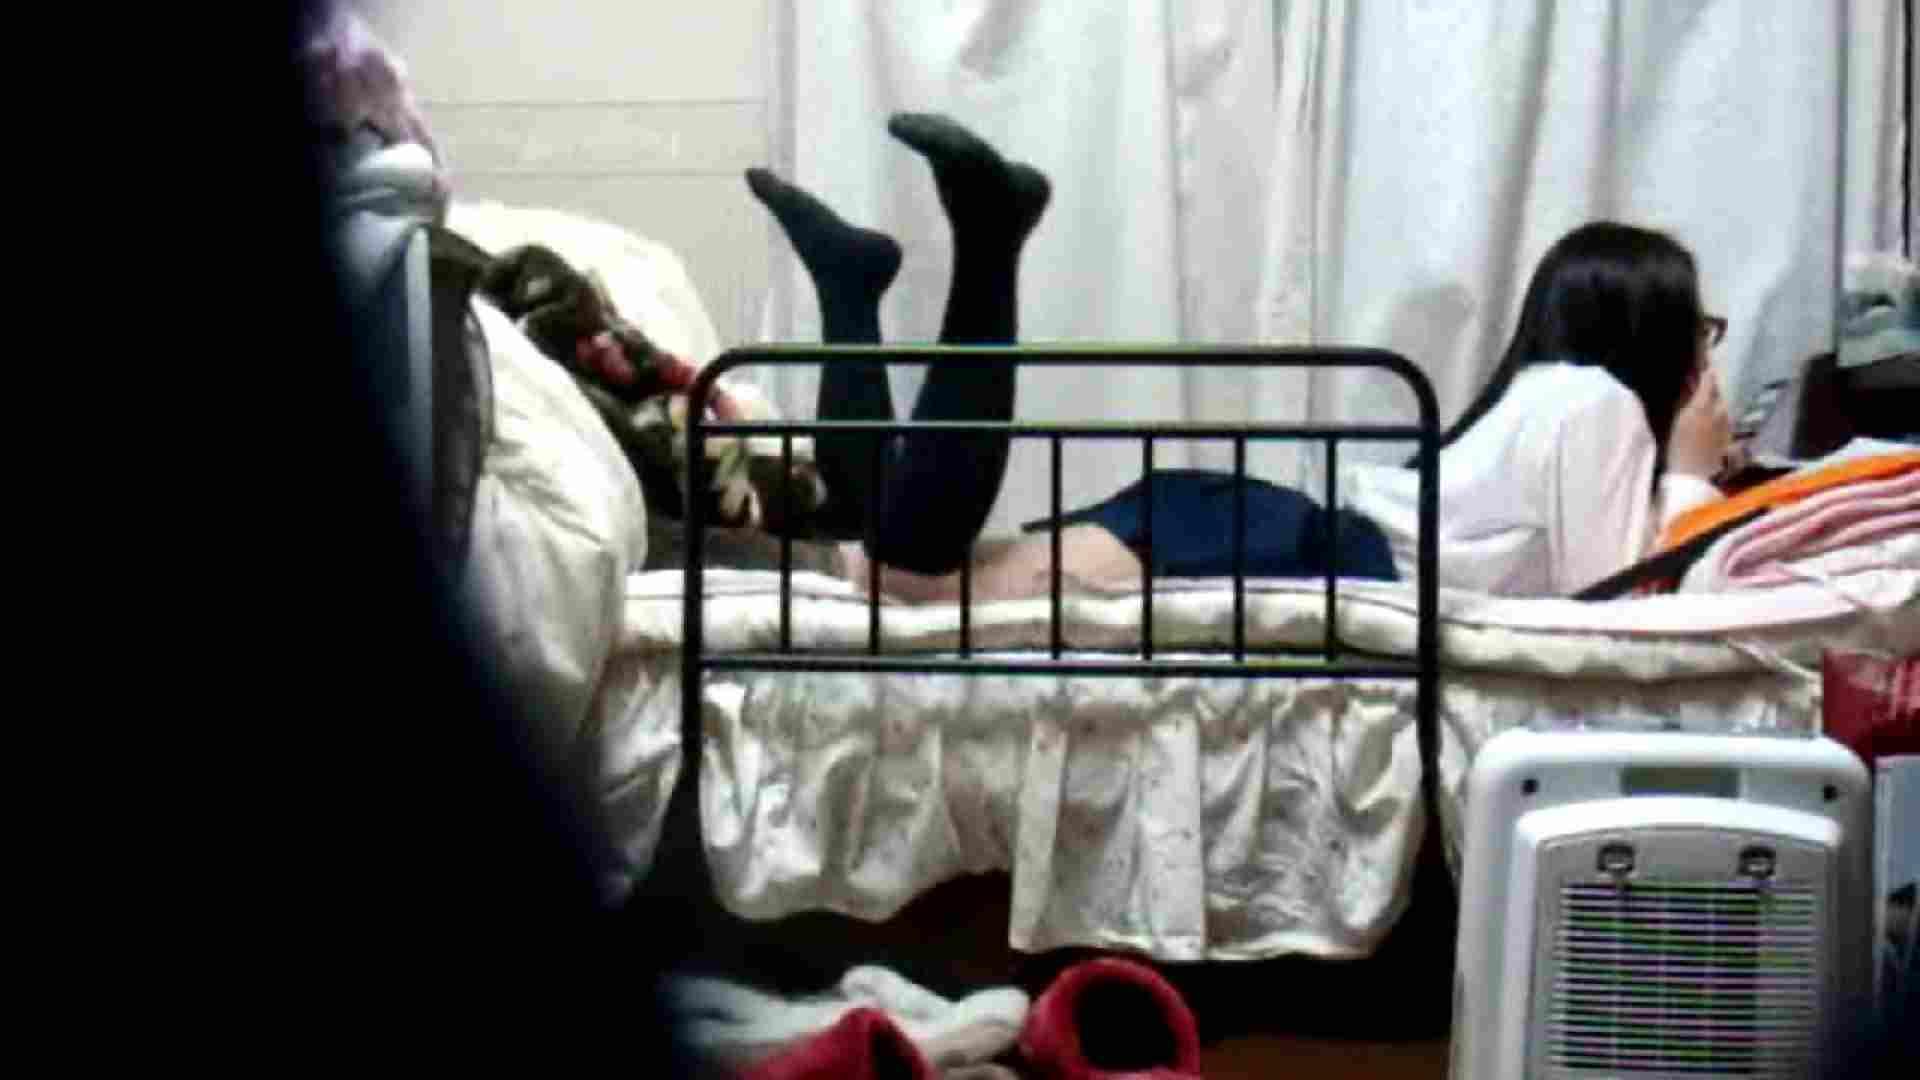 vol.4 まどかの帰宅後の部屋、ベッドで何かが始まります。 ○族 ヌード画像 100画像 35